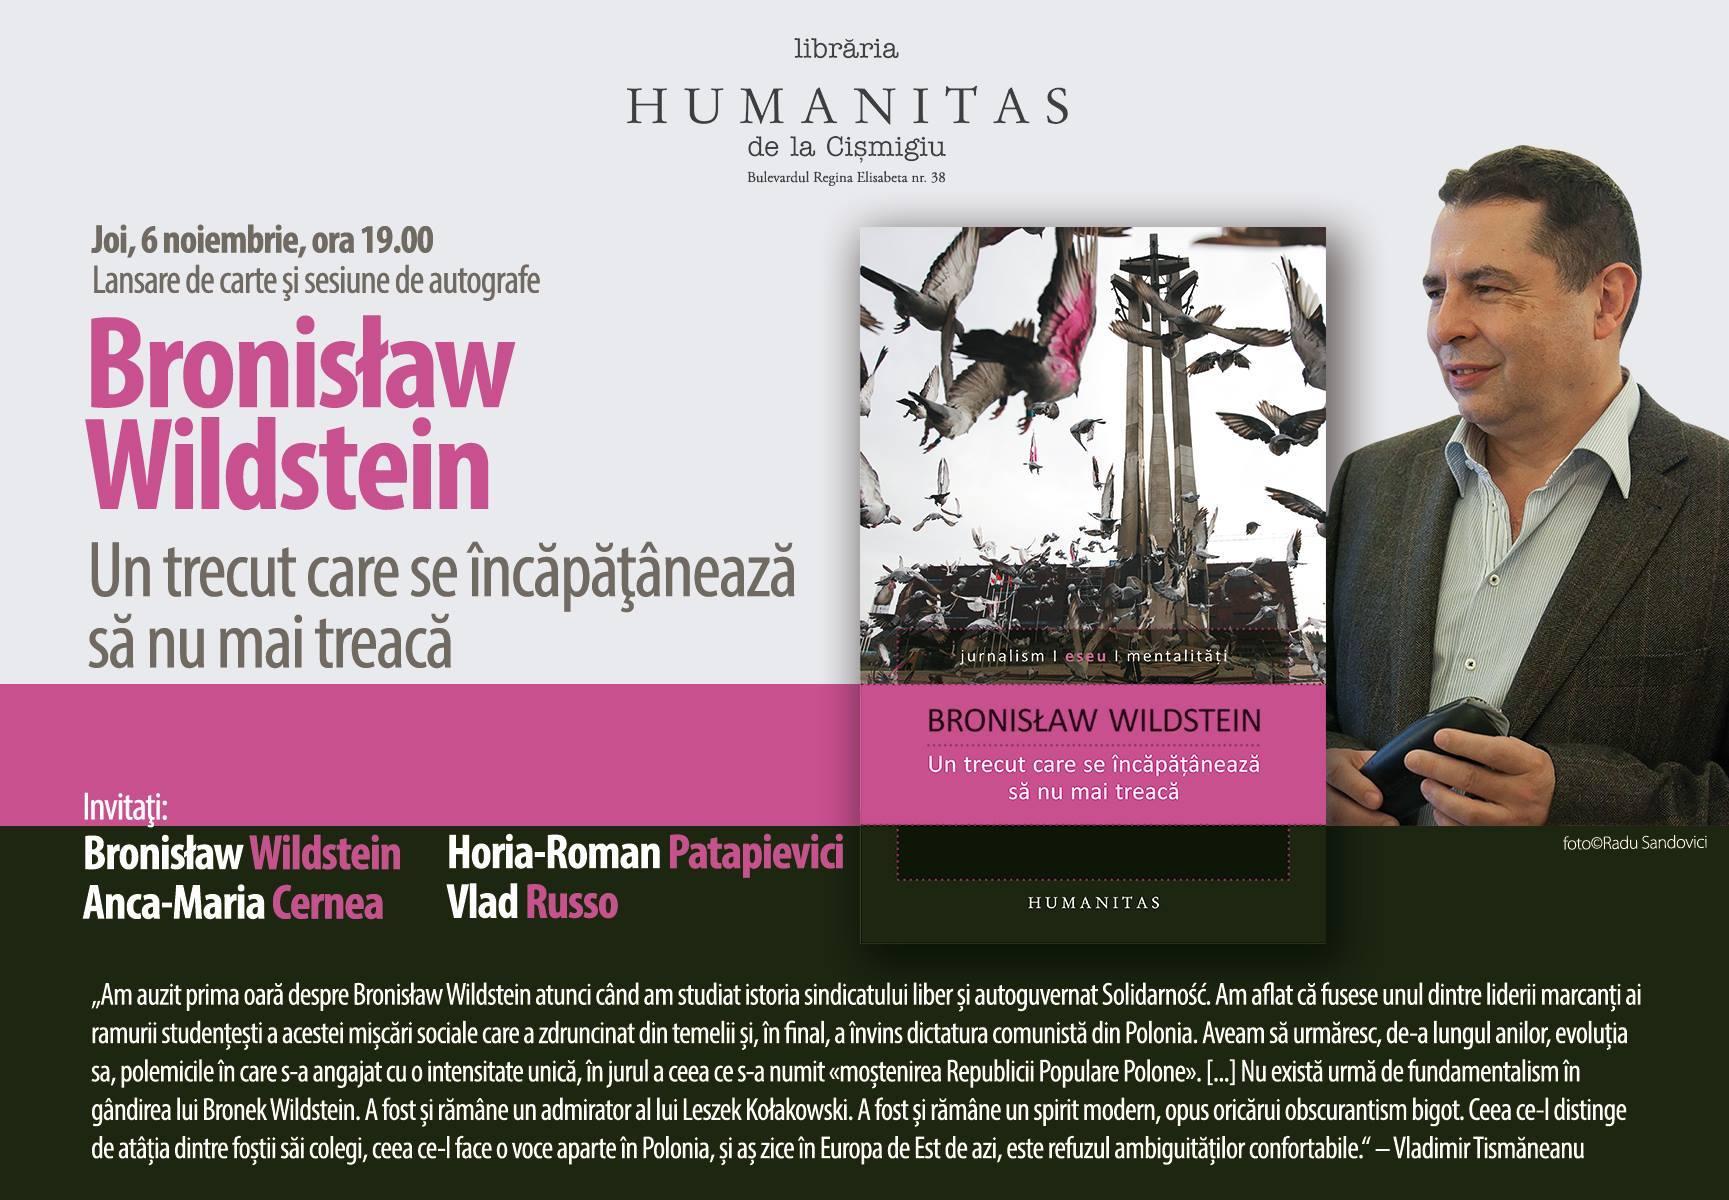 Lansare Bronisław Wildstein la Librăria Humanitas de la Cişmigiu